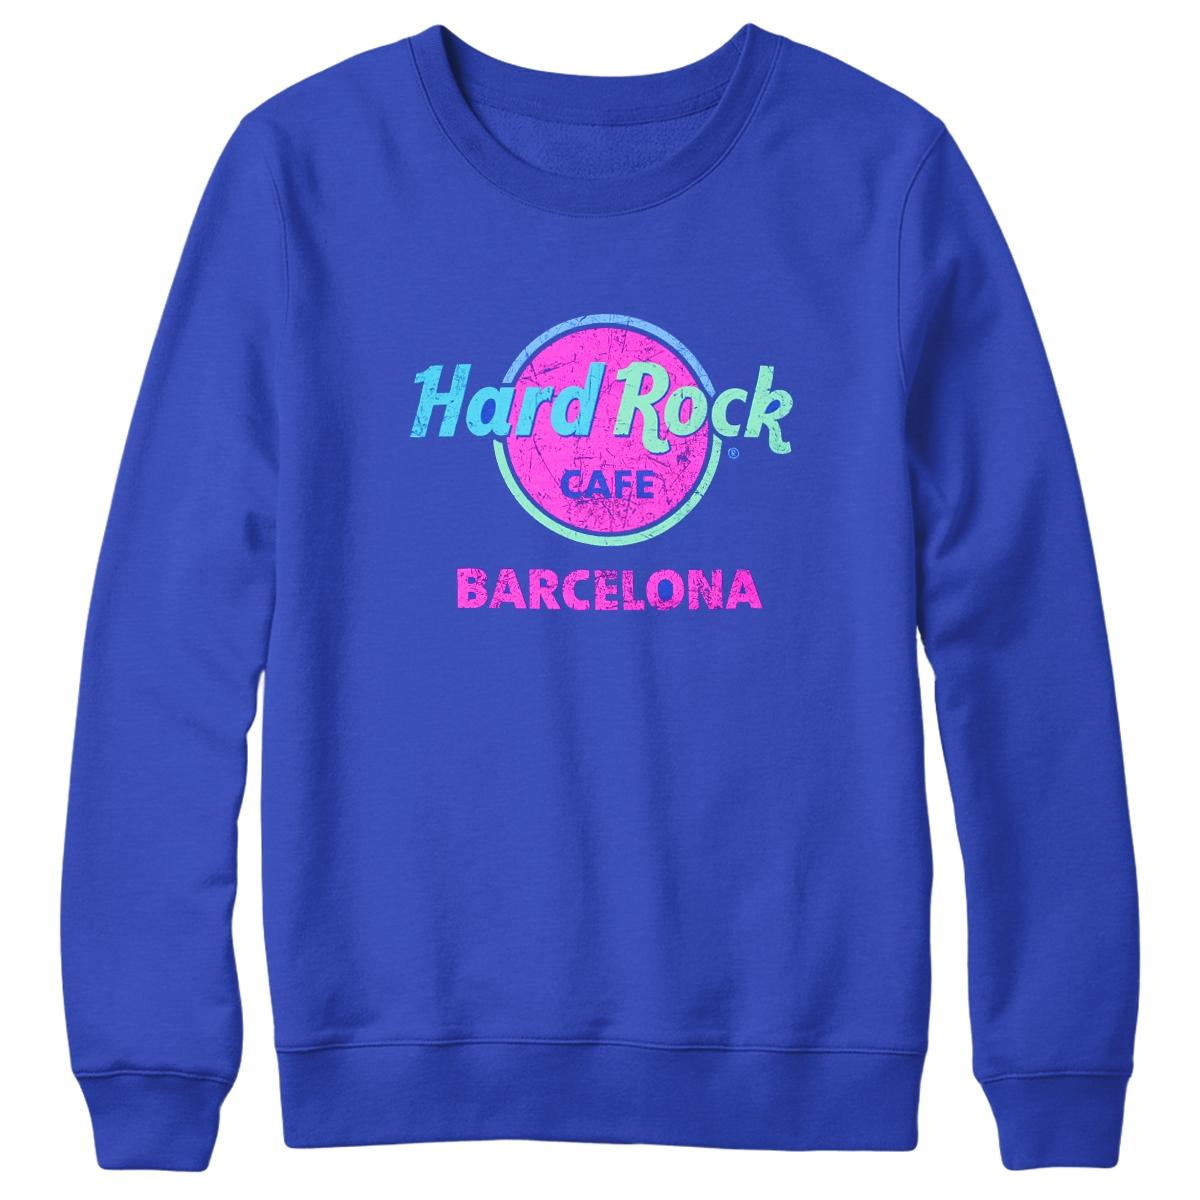 Throwback Logo Sweatshirt Barcelona 0